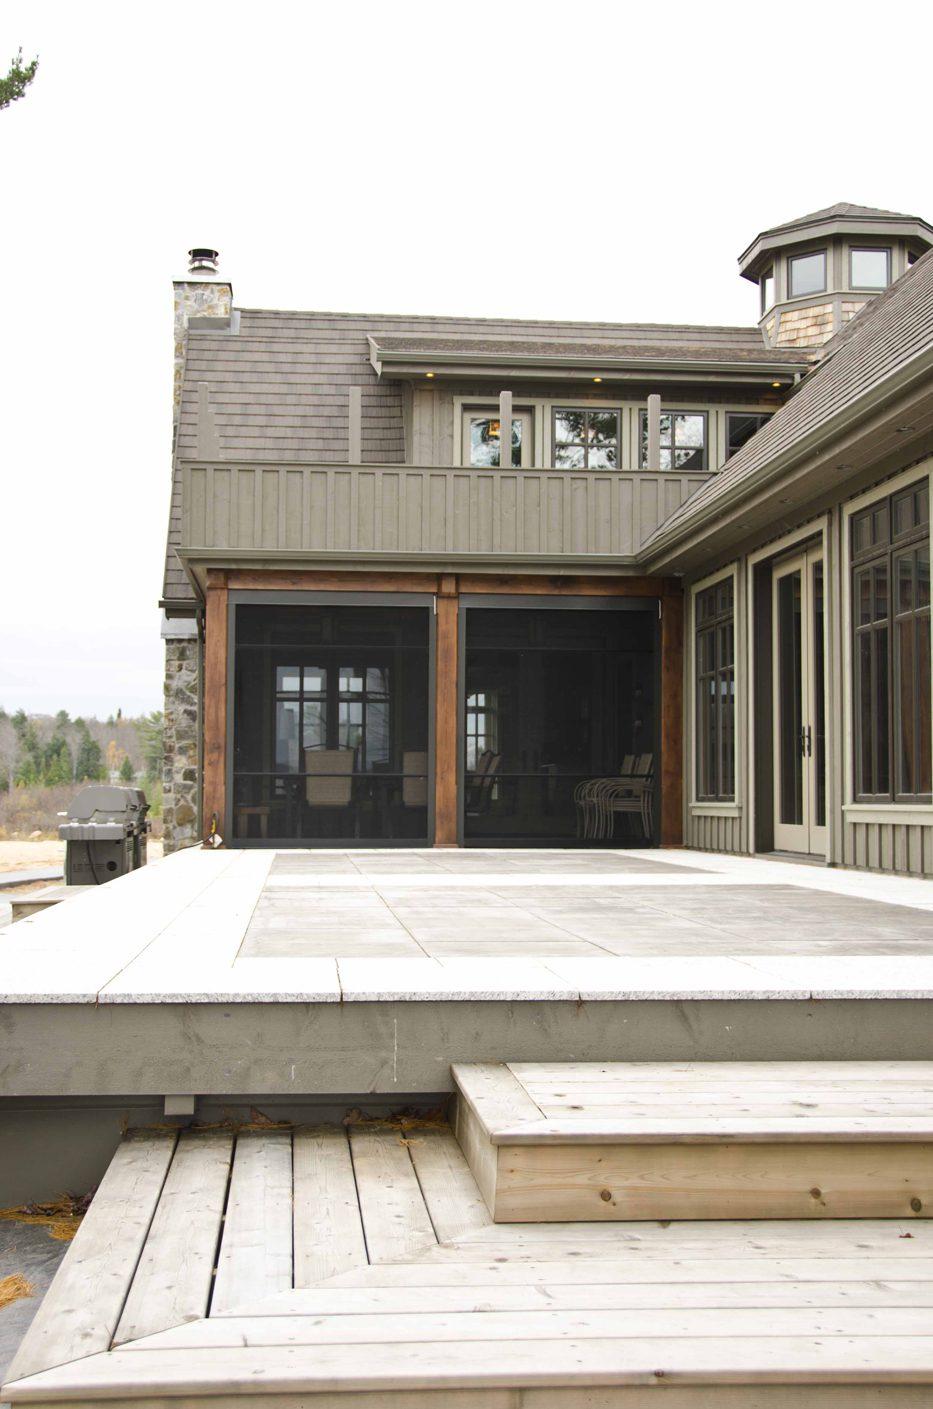 Normerica Timber Frame, Exterior, Cottage, Screened Poch, Deck, Backyard